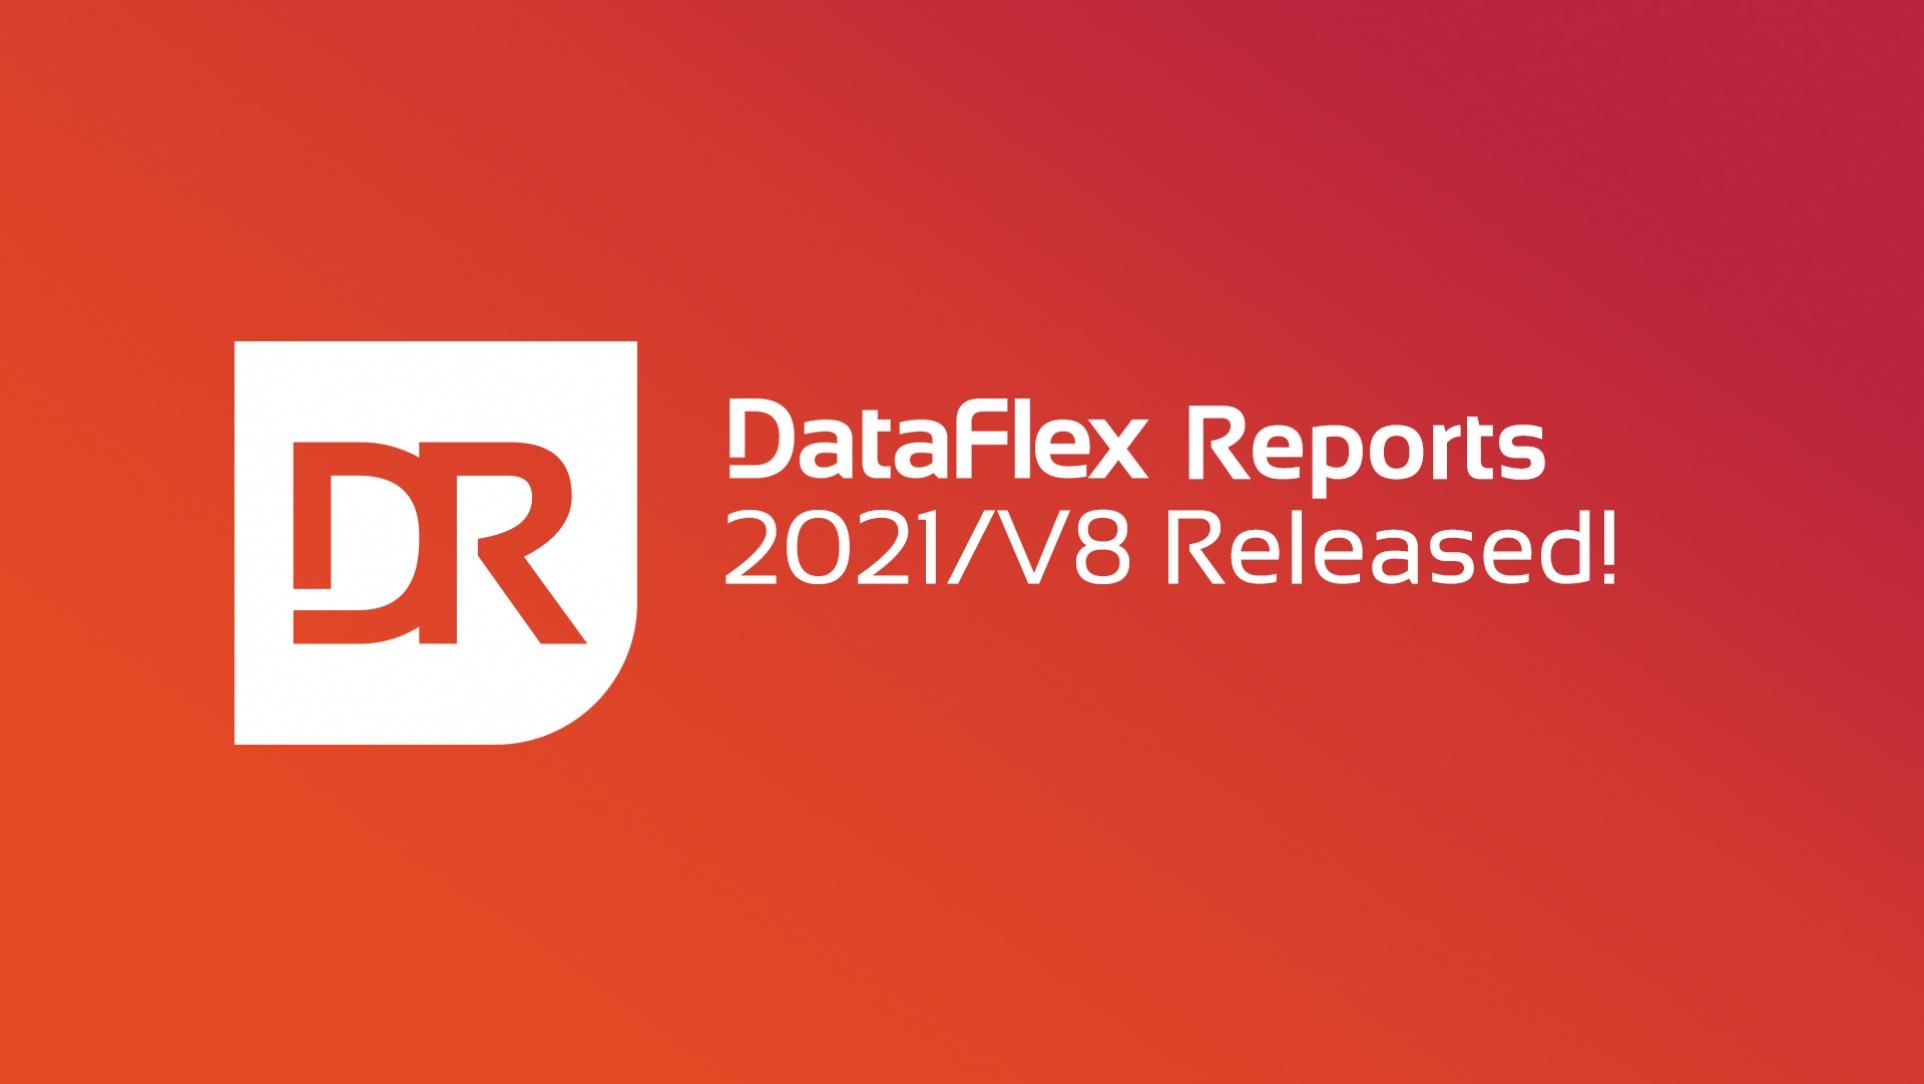 DataFlex Reports Released!